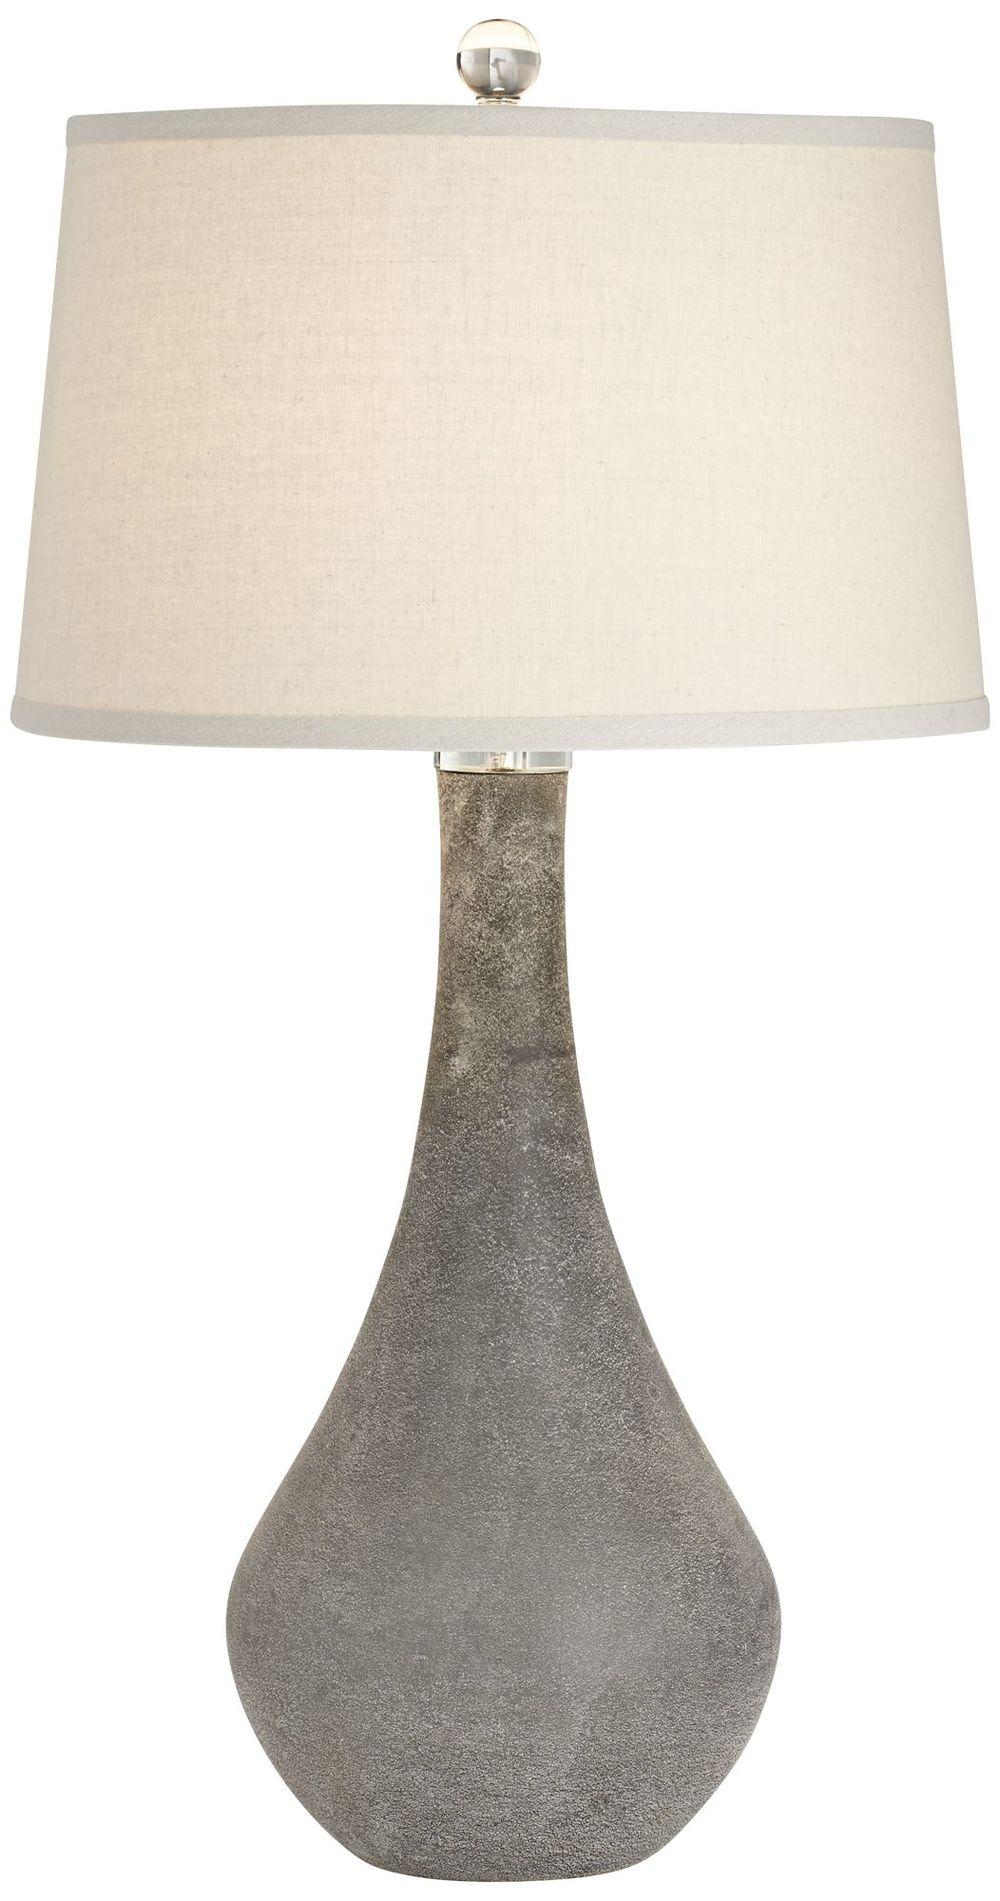 Pacific Coast Lighting - City Shadow Table Lamp